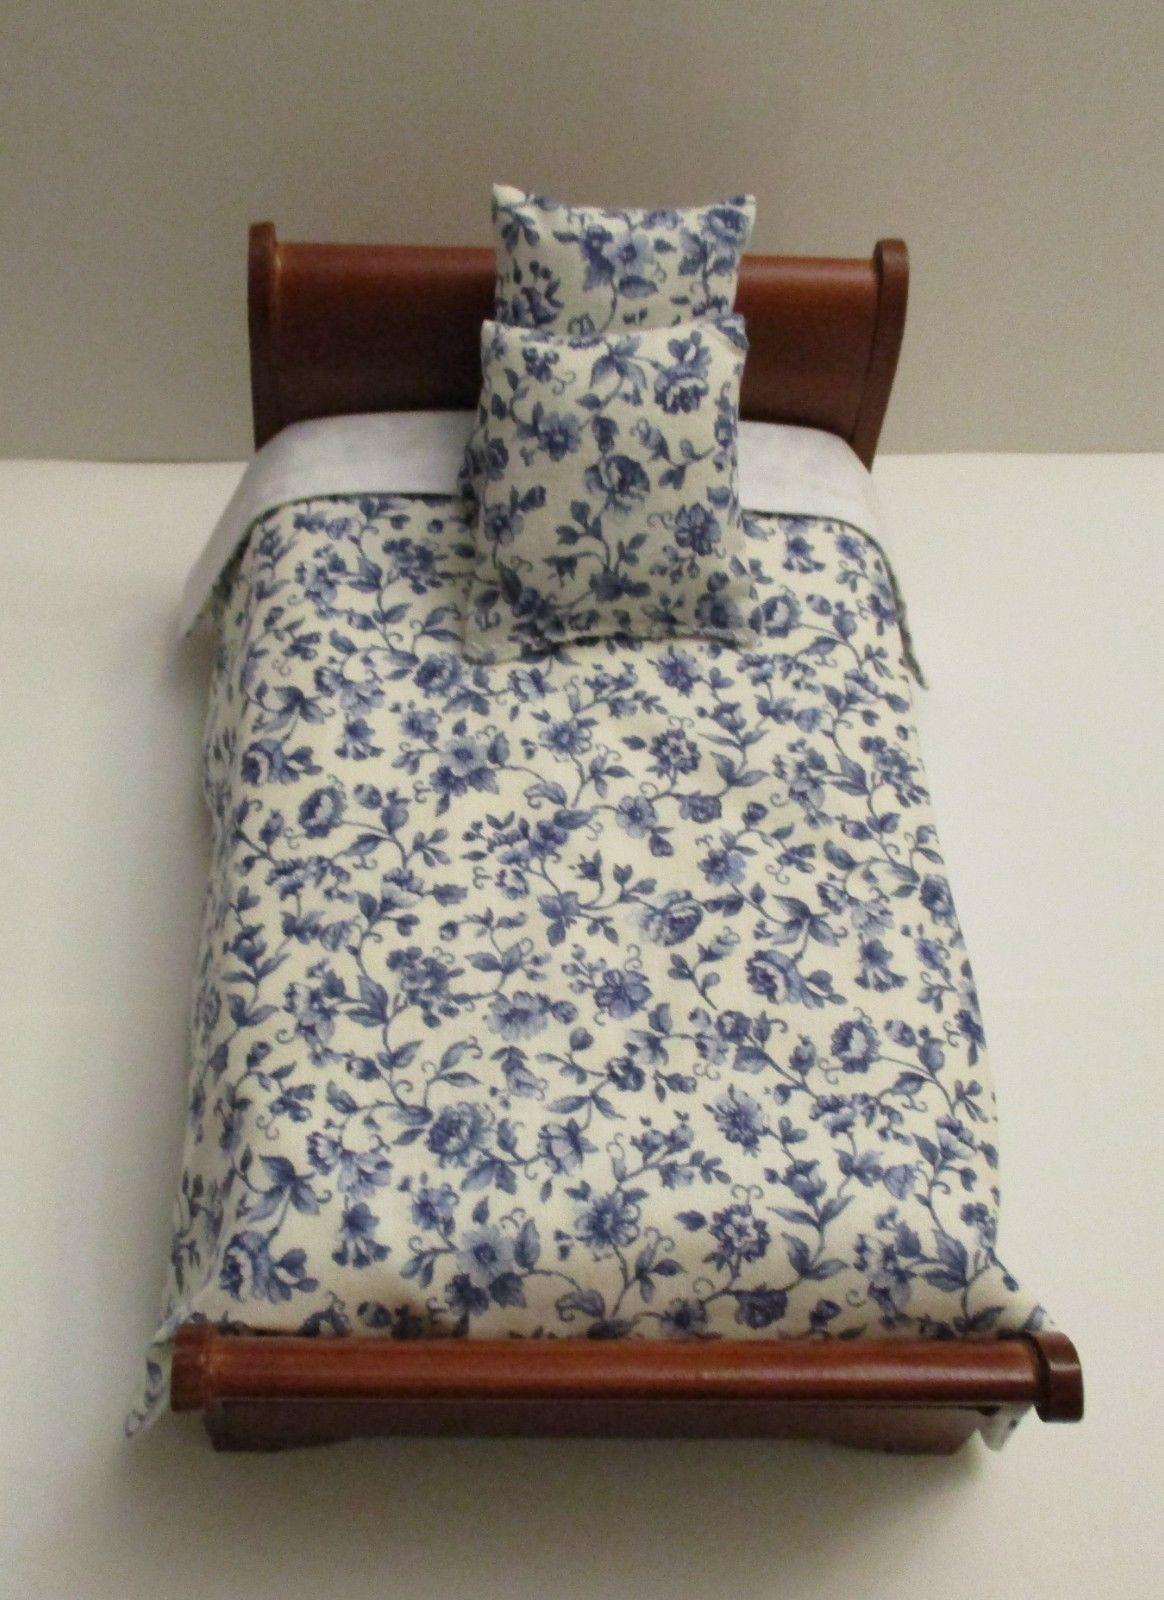 Dollhouse Miniature Handmade Gray Floral Bedspread /& 7 Pillows Bedding Set